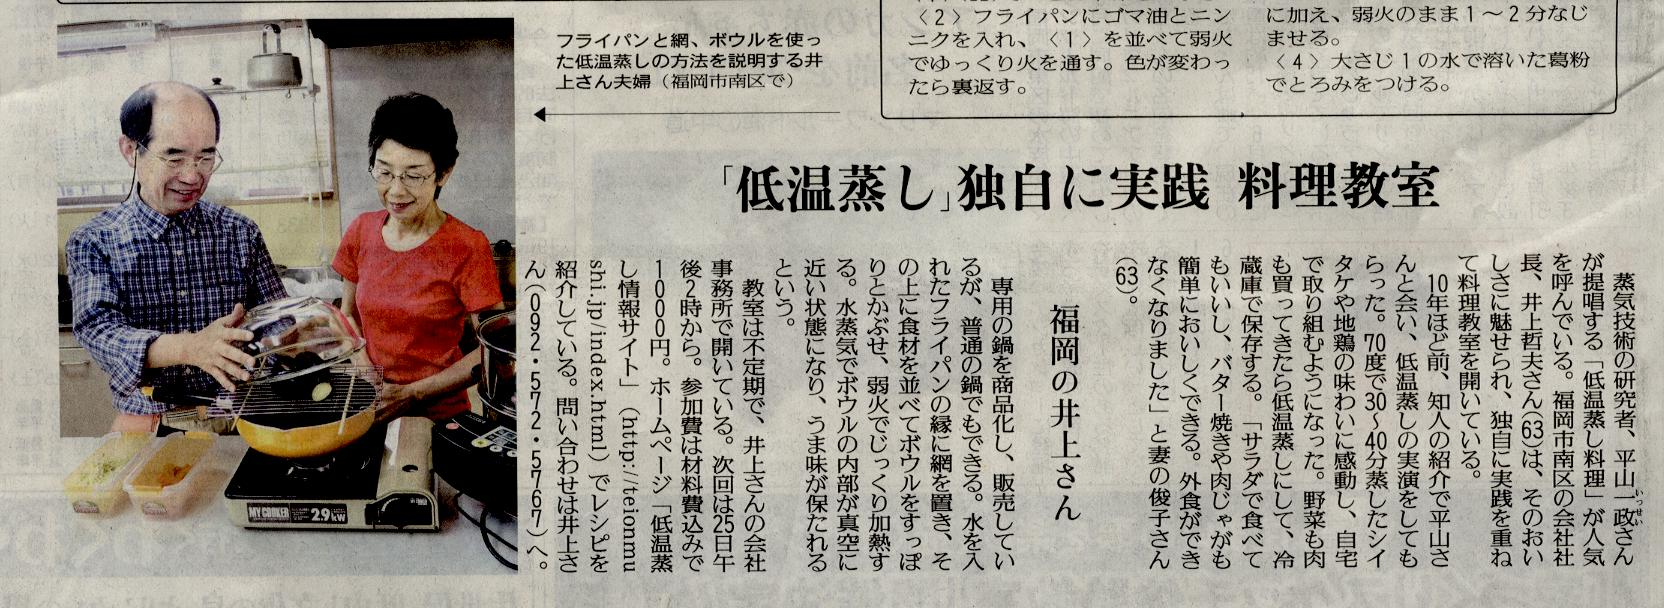 yomiuri20120819zoom.jpg